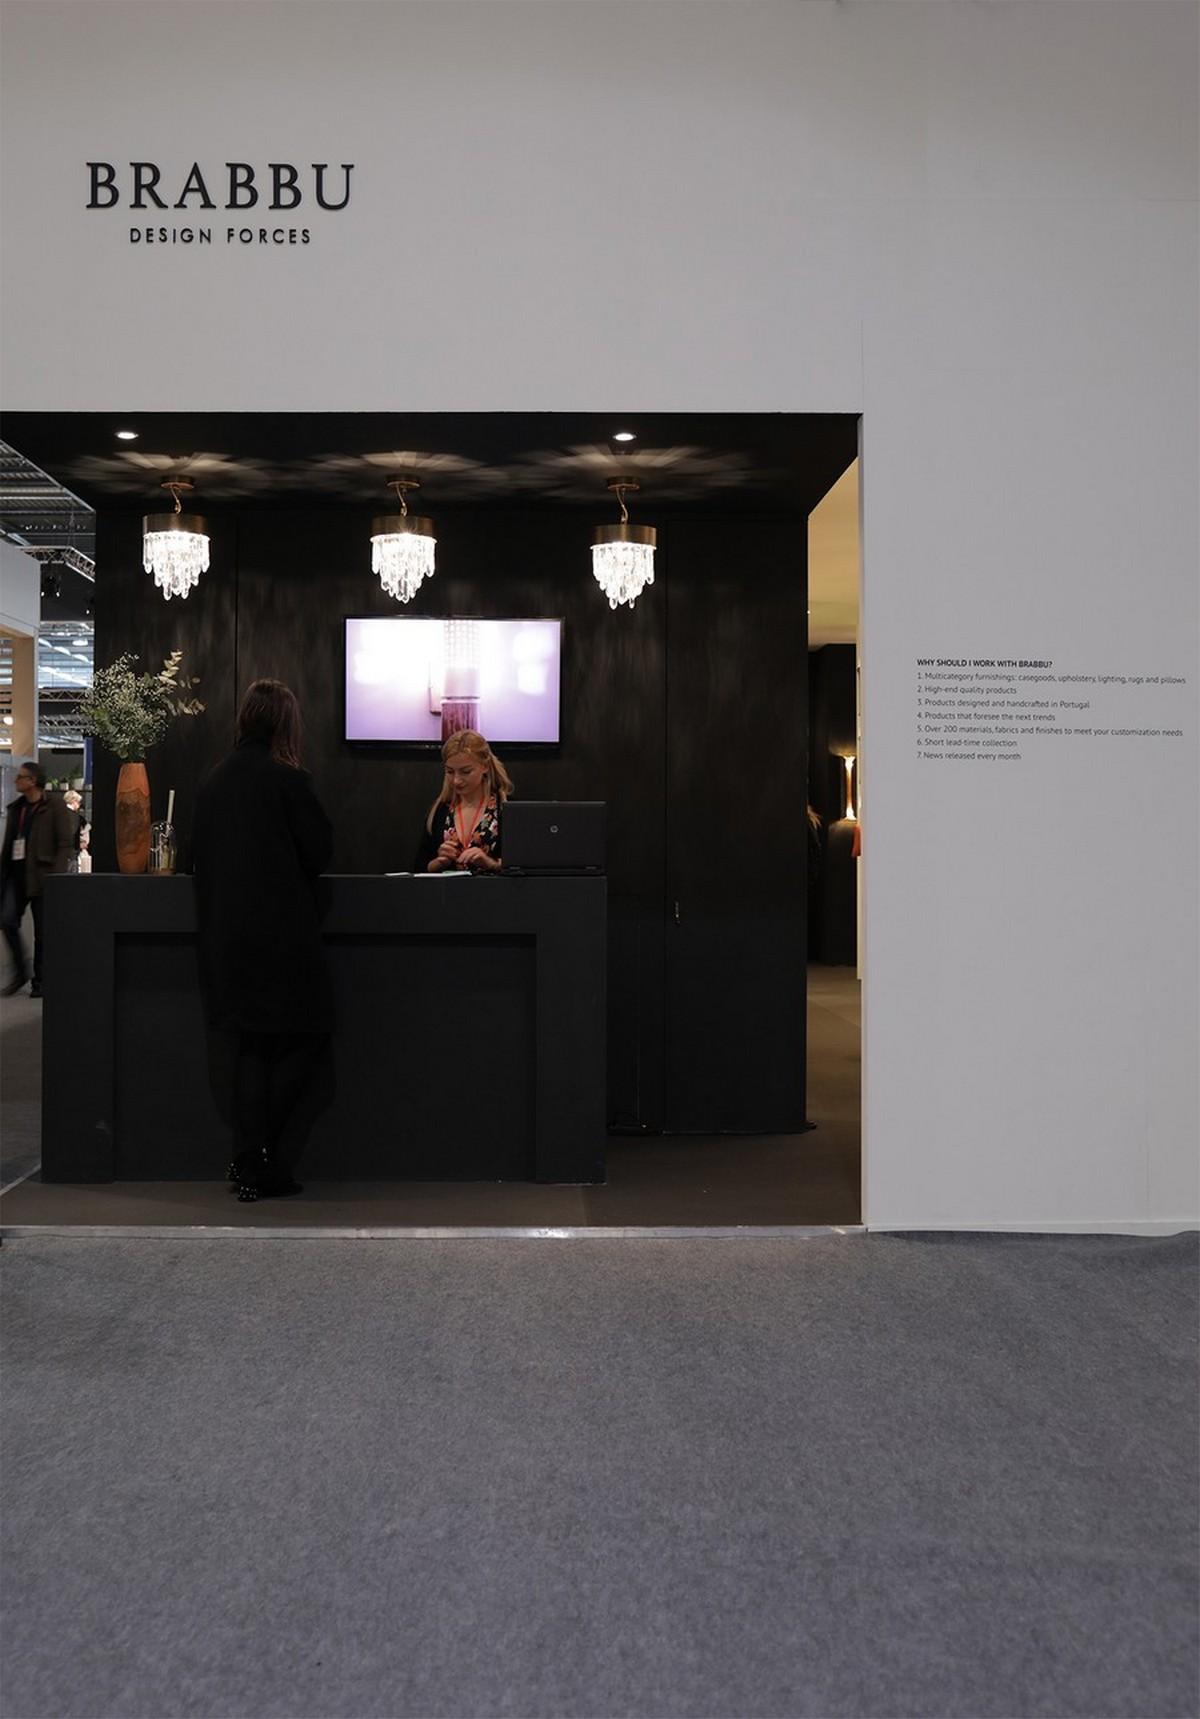 "Maison et Objet 4  ""The Best Booth Design"" Award from MOM 18 goes to Brabbu foto capa brabbu 1"